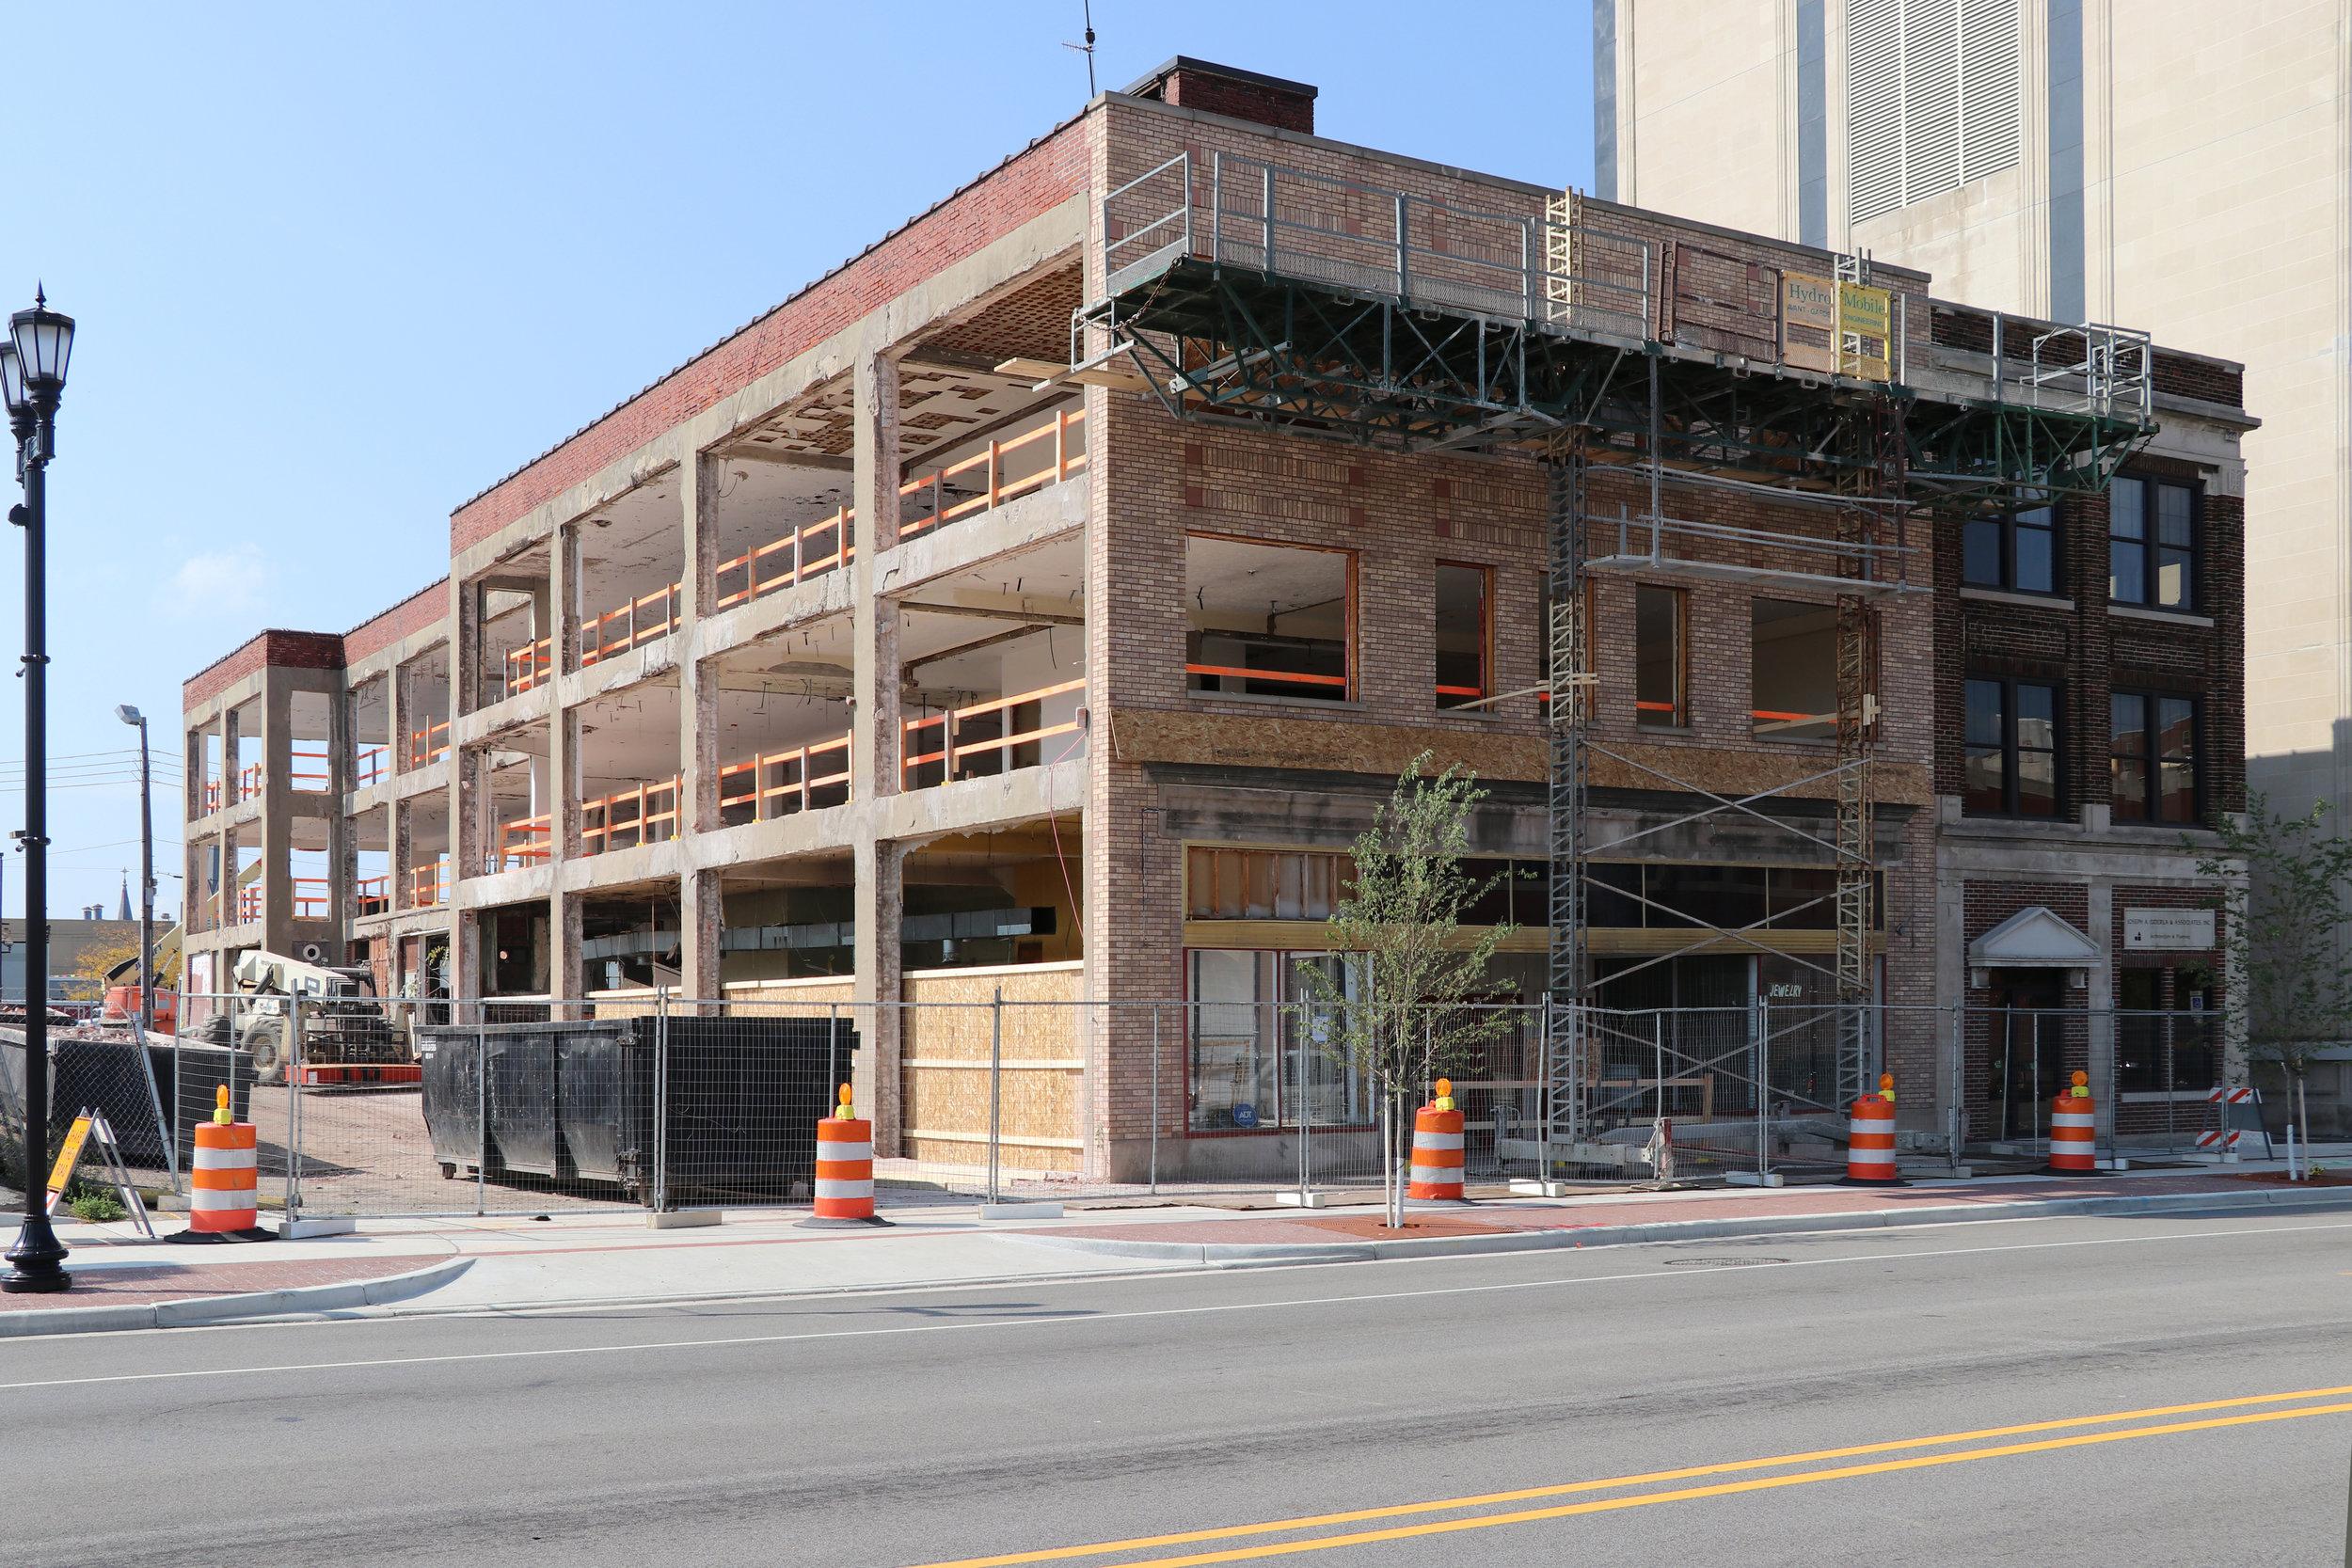 Renovation demo finished on Hibberd Building.